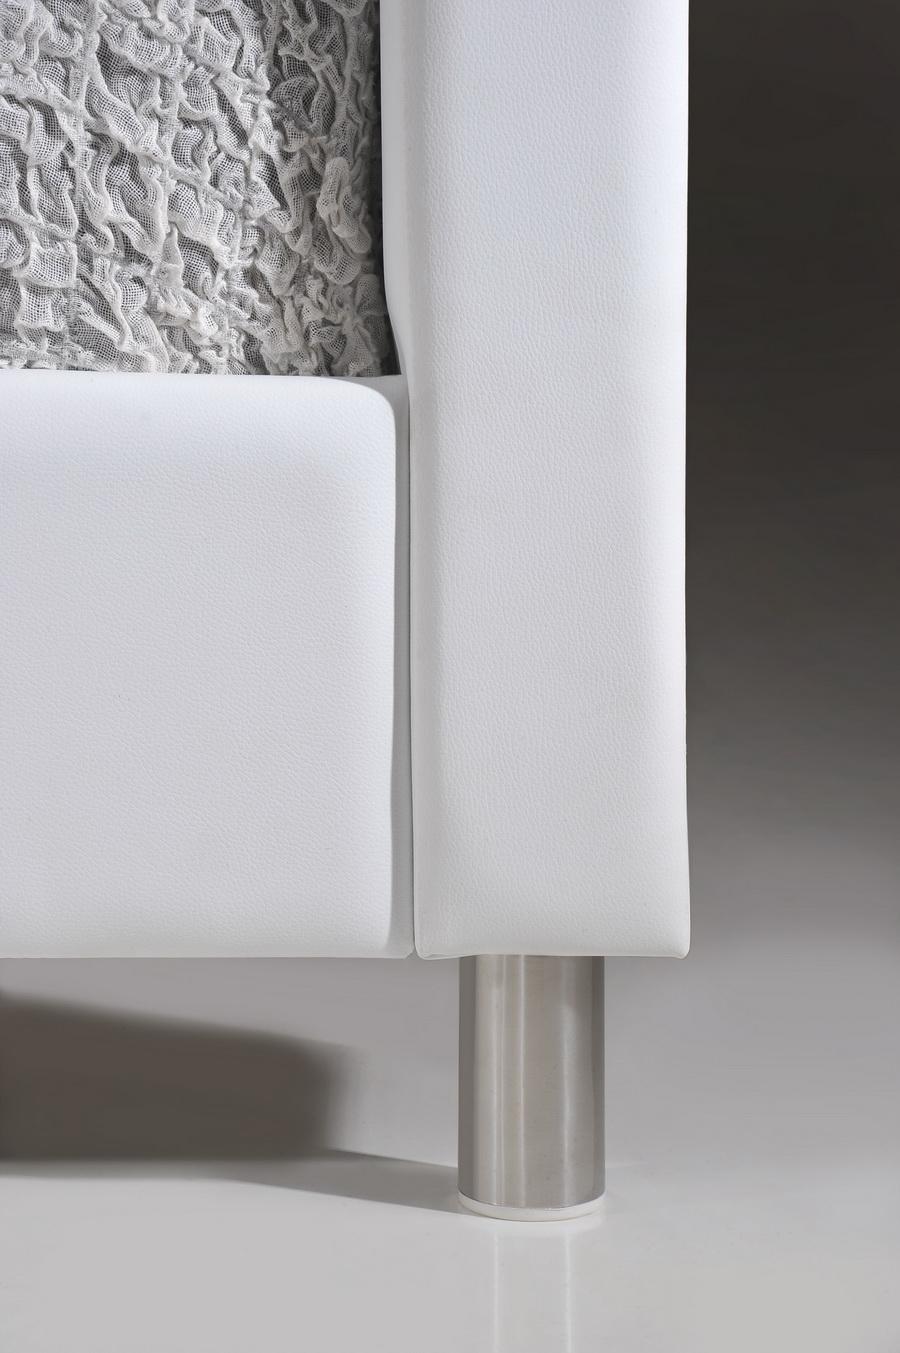 Baxton Studio Carlotta White Modern Bed With Upholstered Headboard King Size Bbt6376